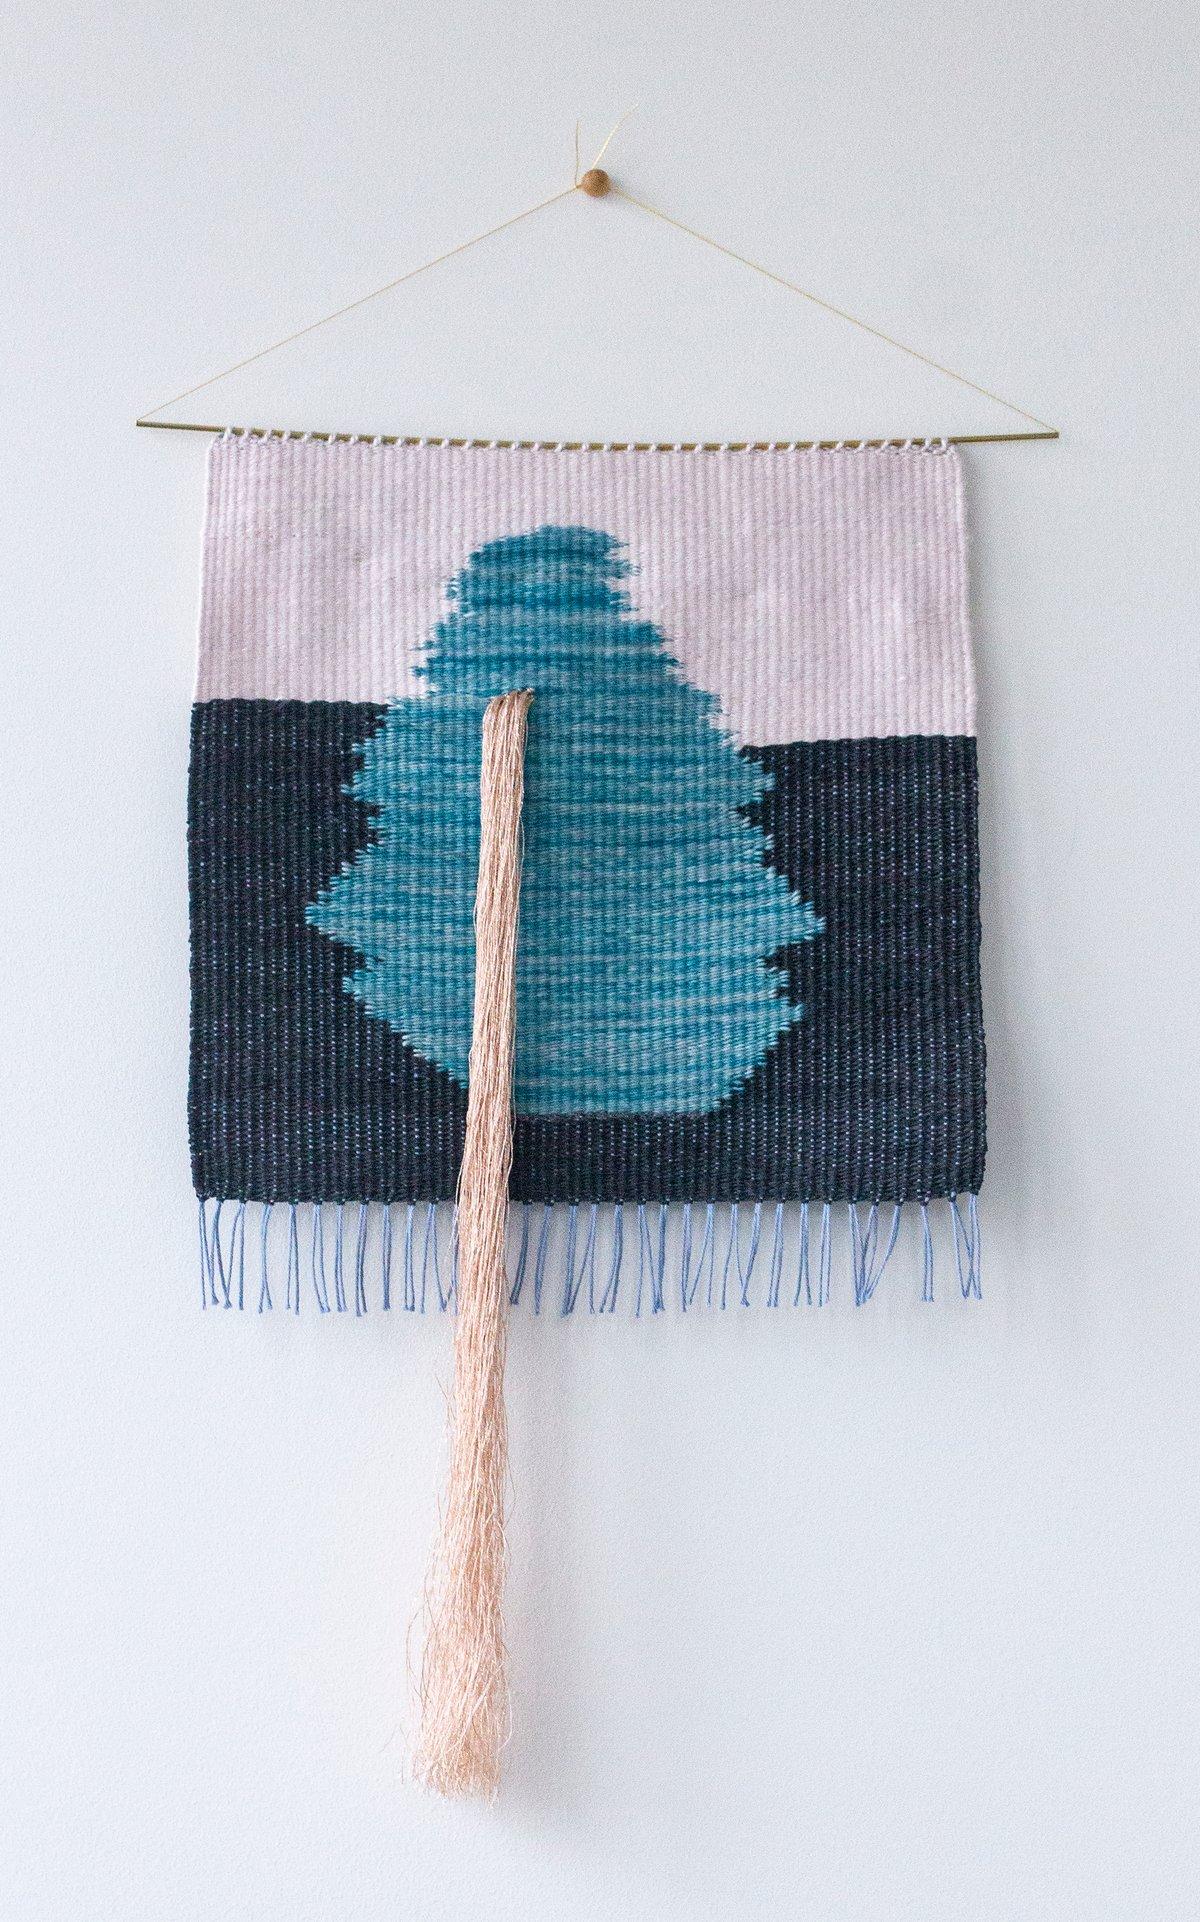 Image of Weaving